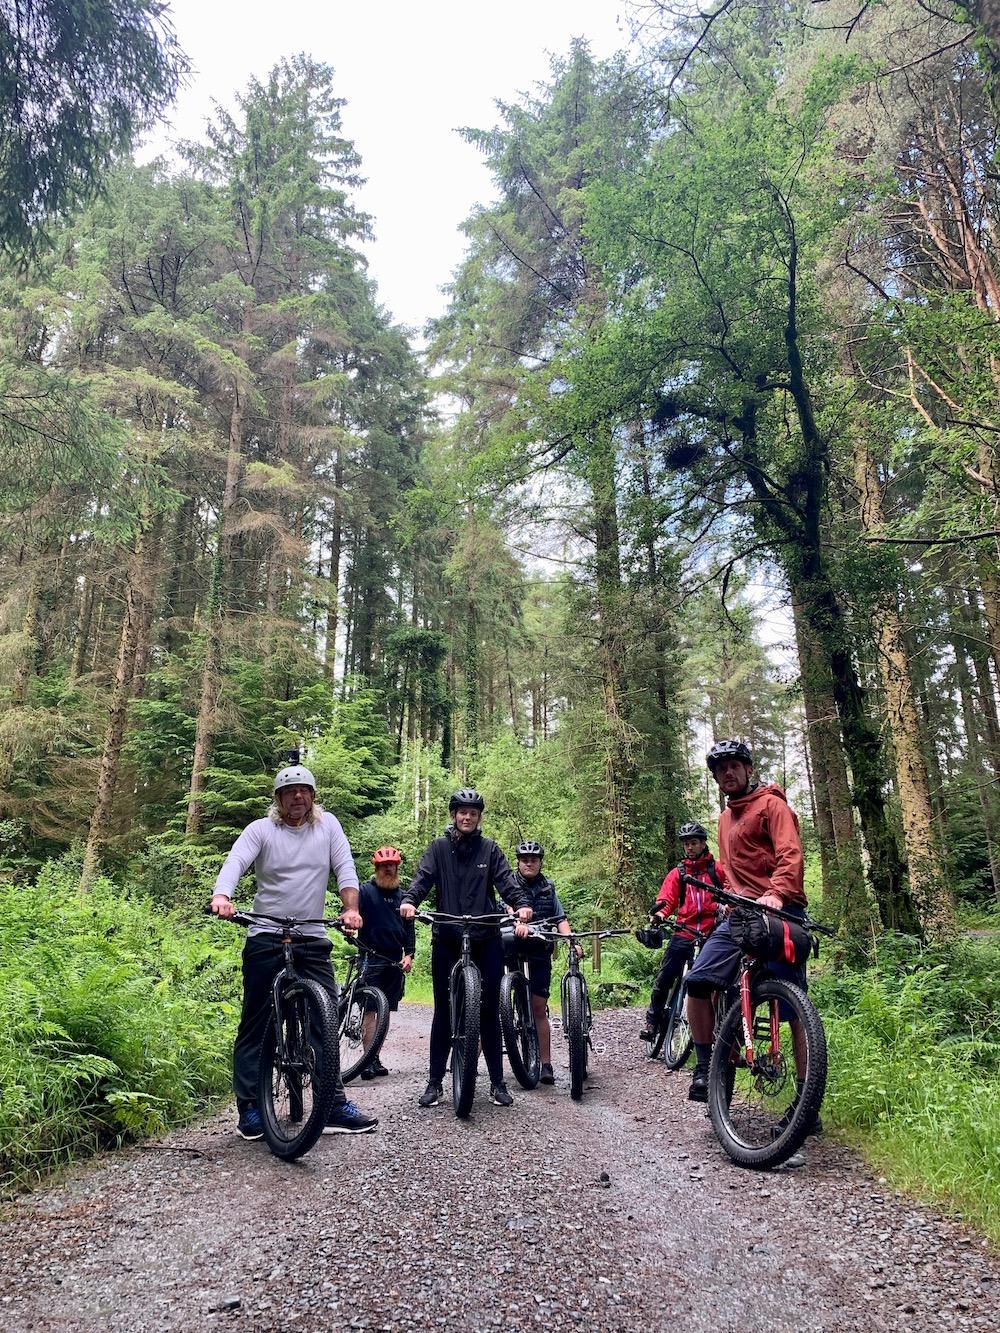 bikepacking in North Wales